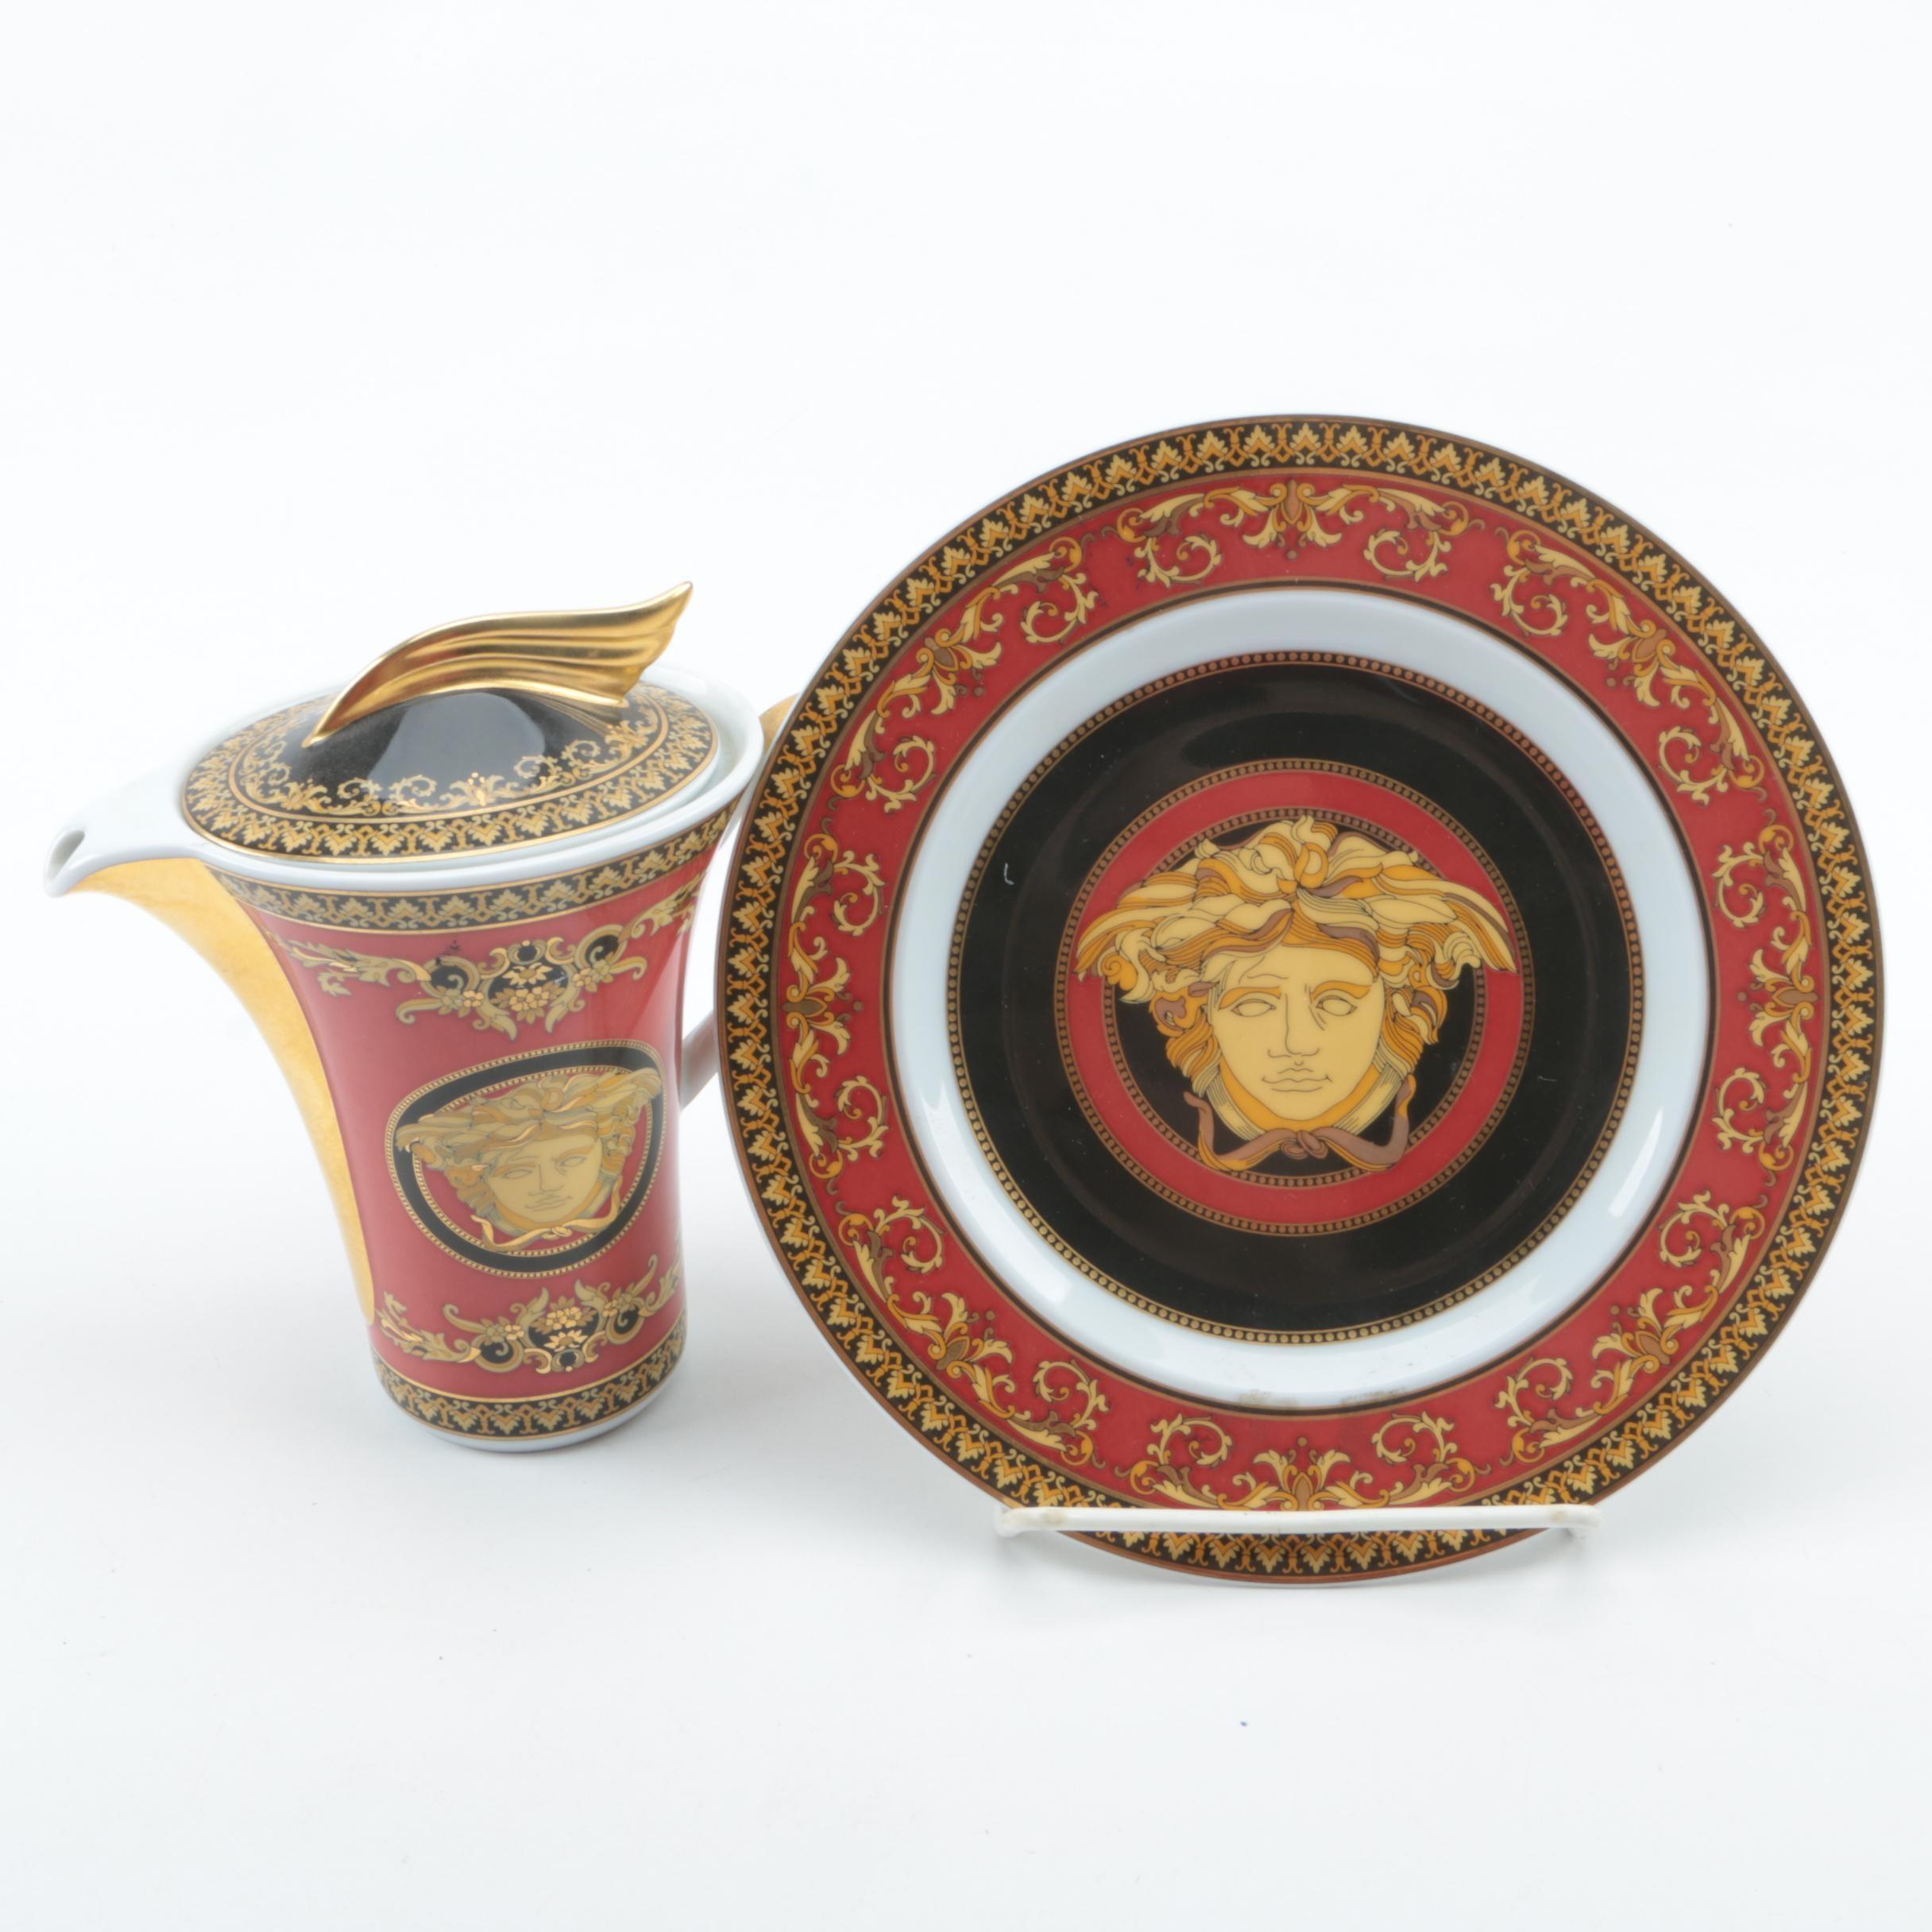 Versace  Medusa  Porcelain Tableware by Rosenthal ...  sc 1 st  EBTH.com & Versace